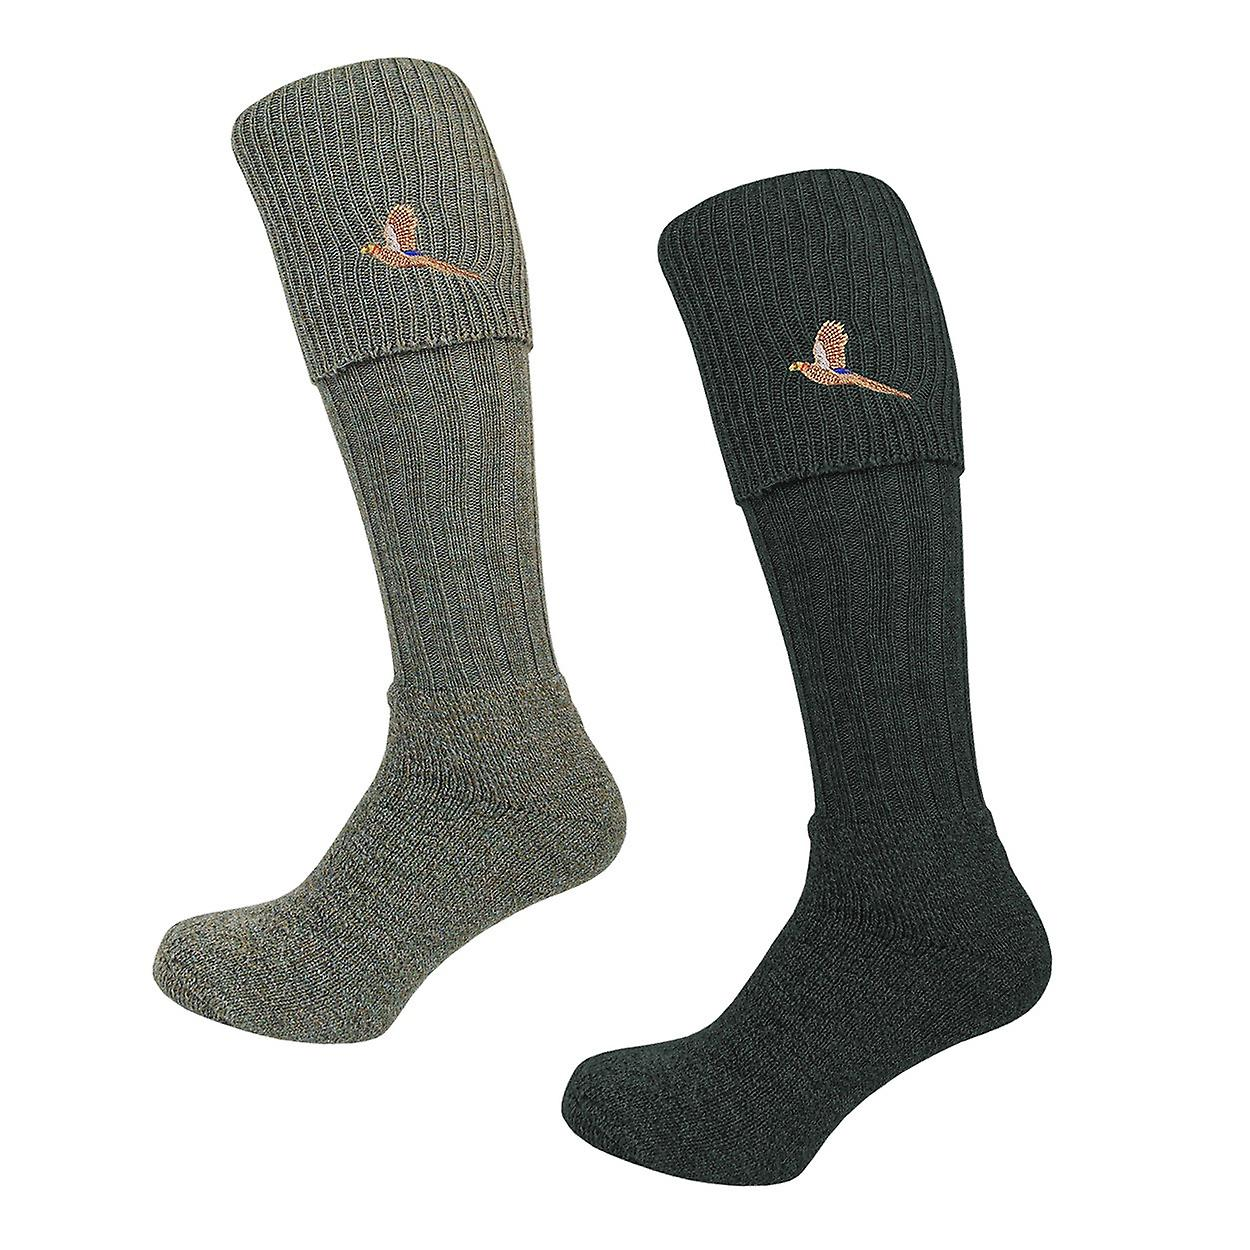 Bisley Socken - Socken Fasan bestickt Breeks traditionellen schießen, Jagd